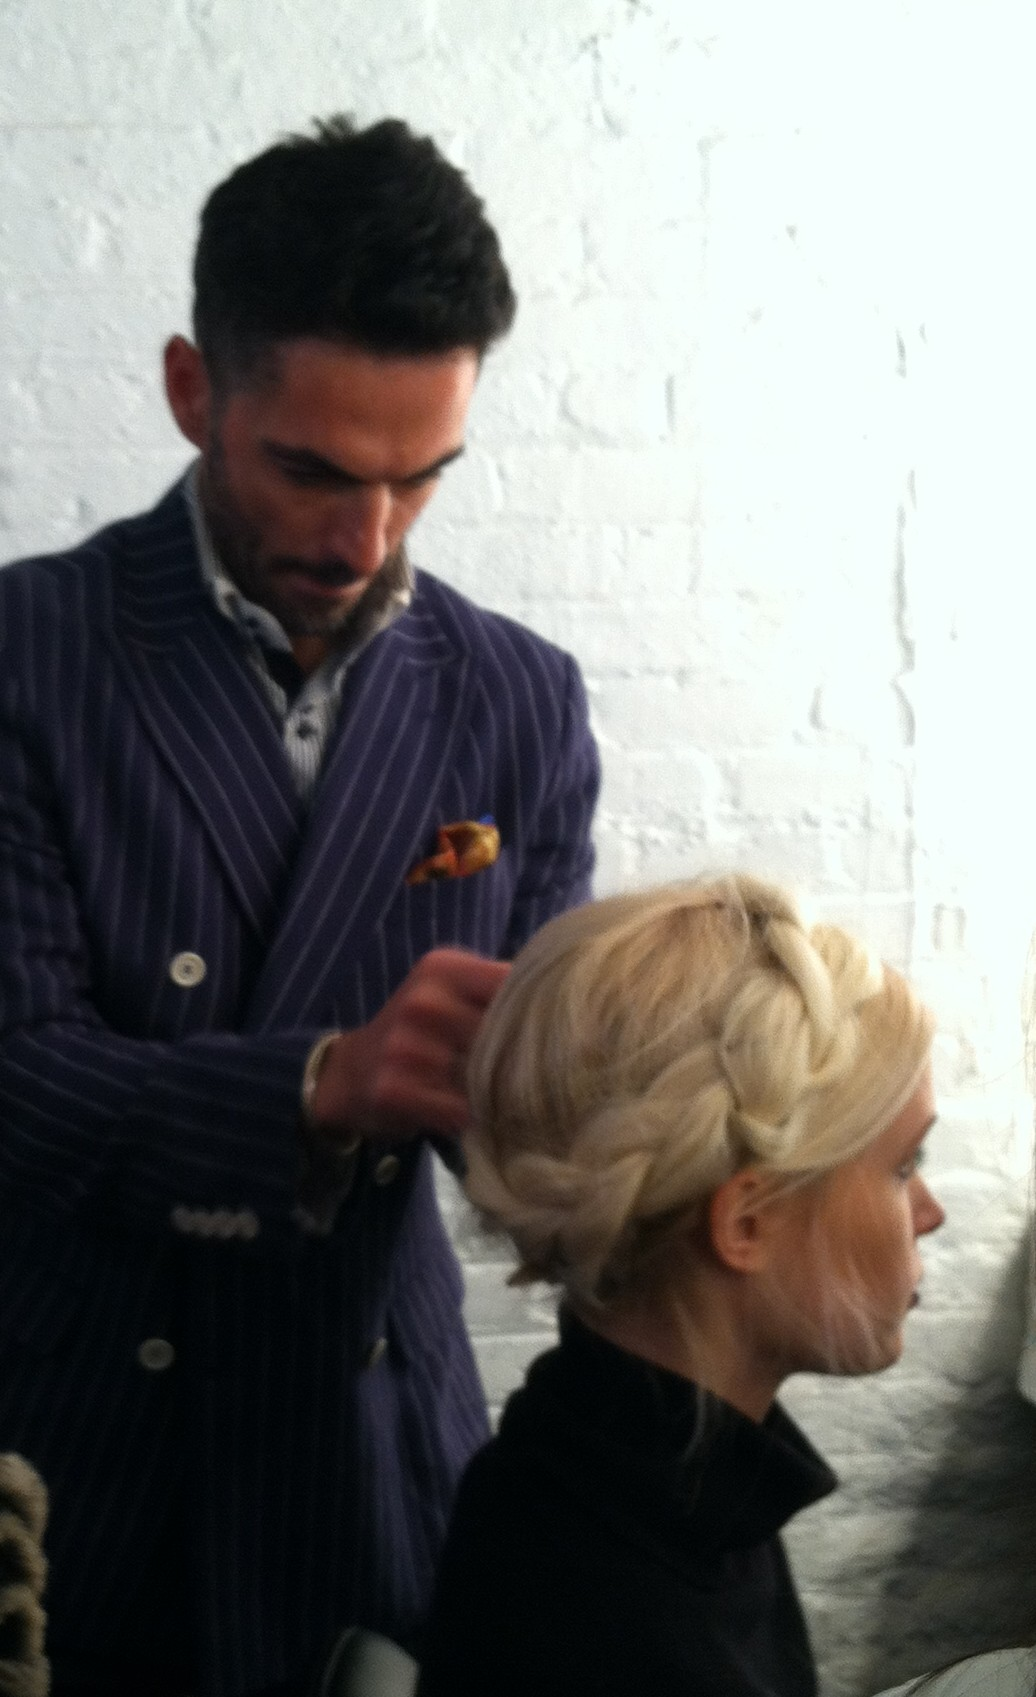 A braided extension is fastenednear the natural hair braids